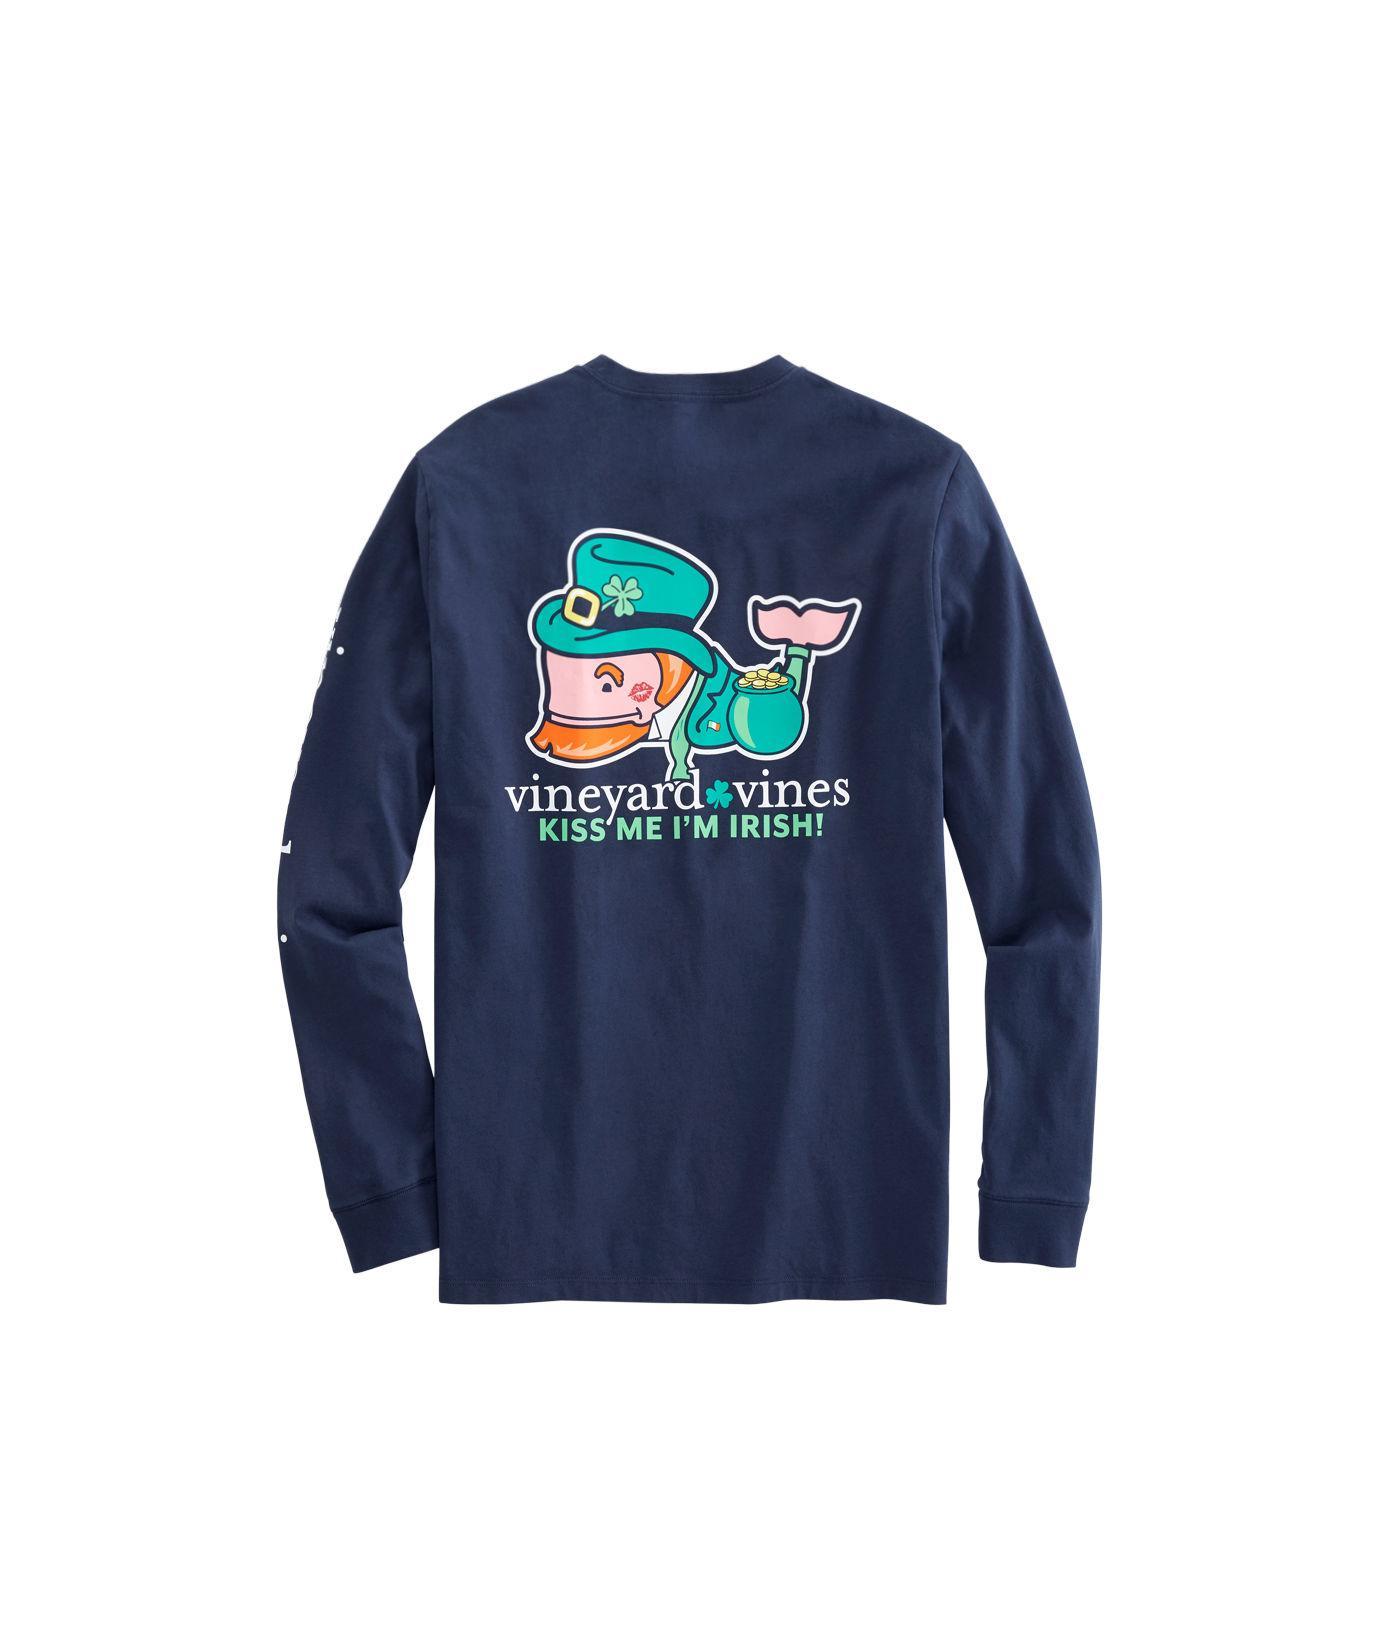 f7e7064bf5ca Lyst - Vineyard Vines Long-sleeve Kiss Me I m Irish Pocket T-shirt ...